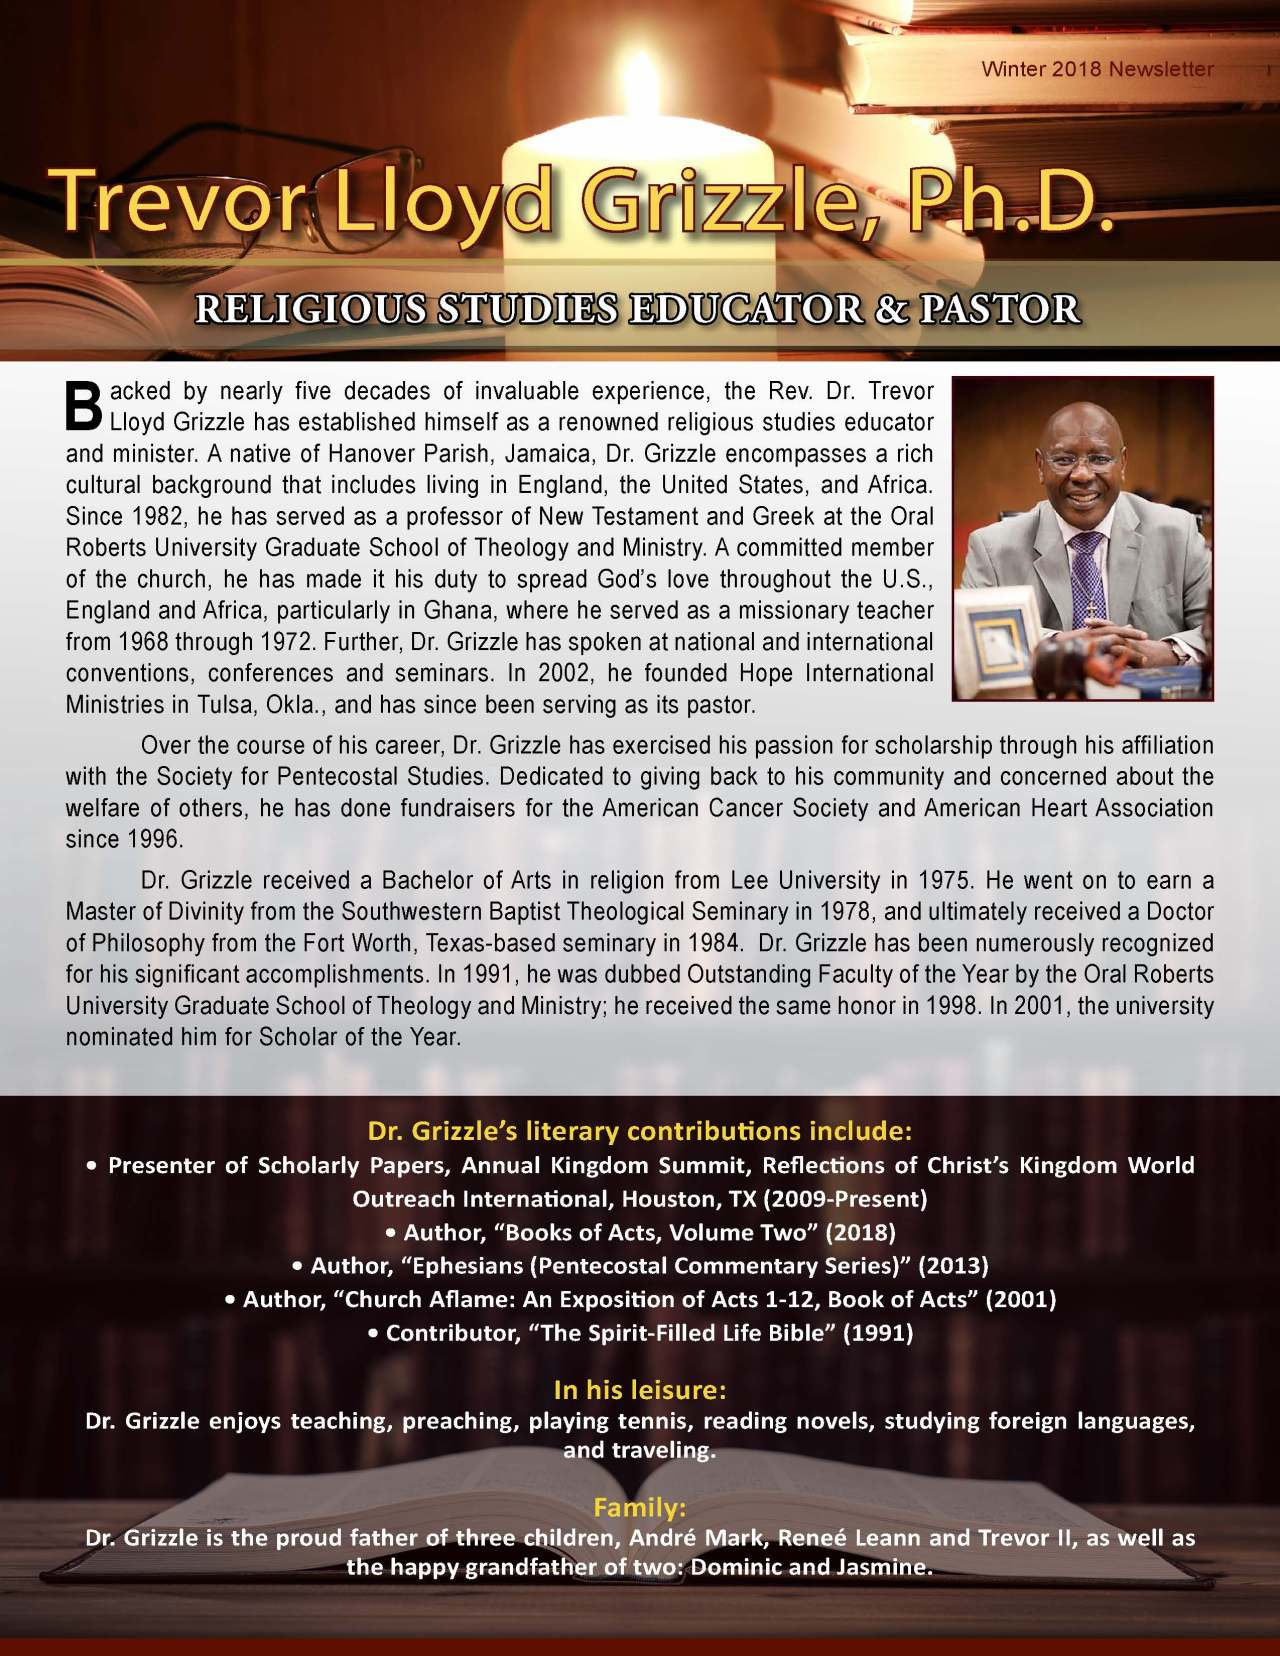 Grizzle, Trevor 3662818_30610983 Newsletter REVISED.jpg